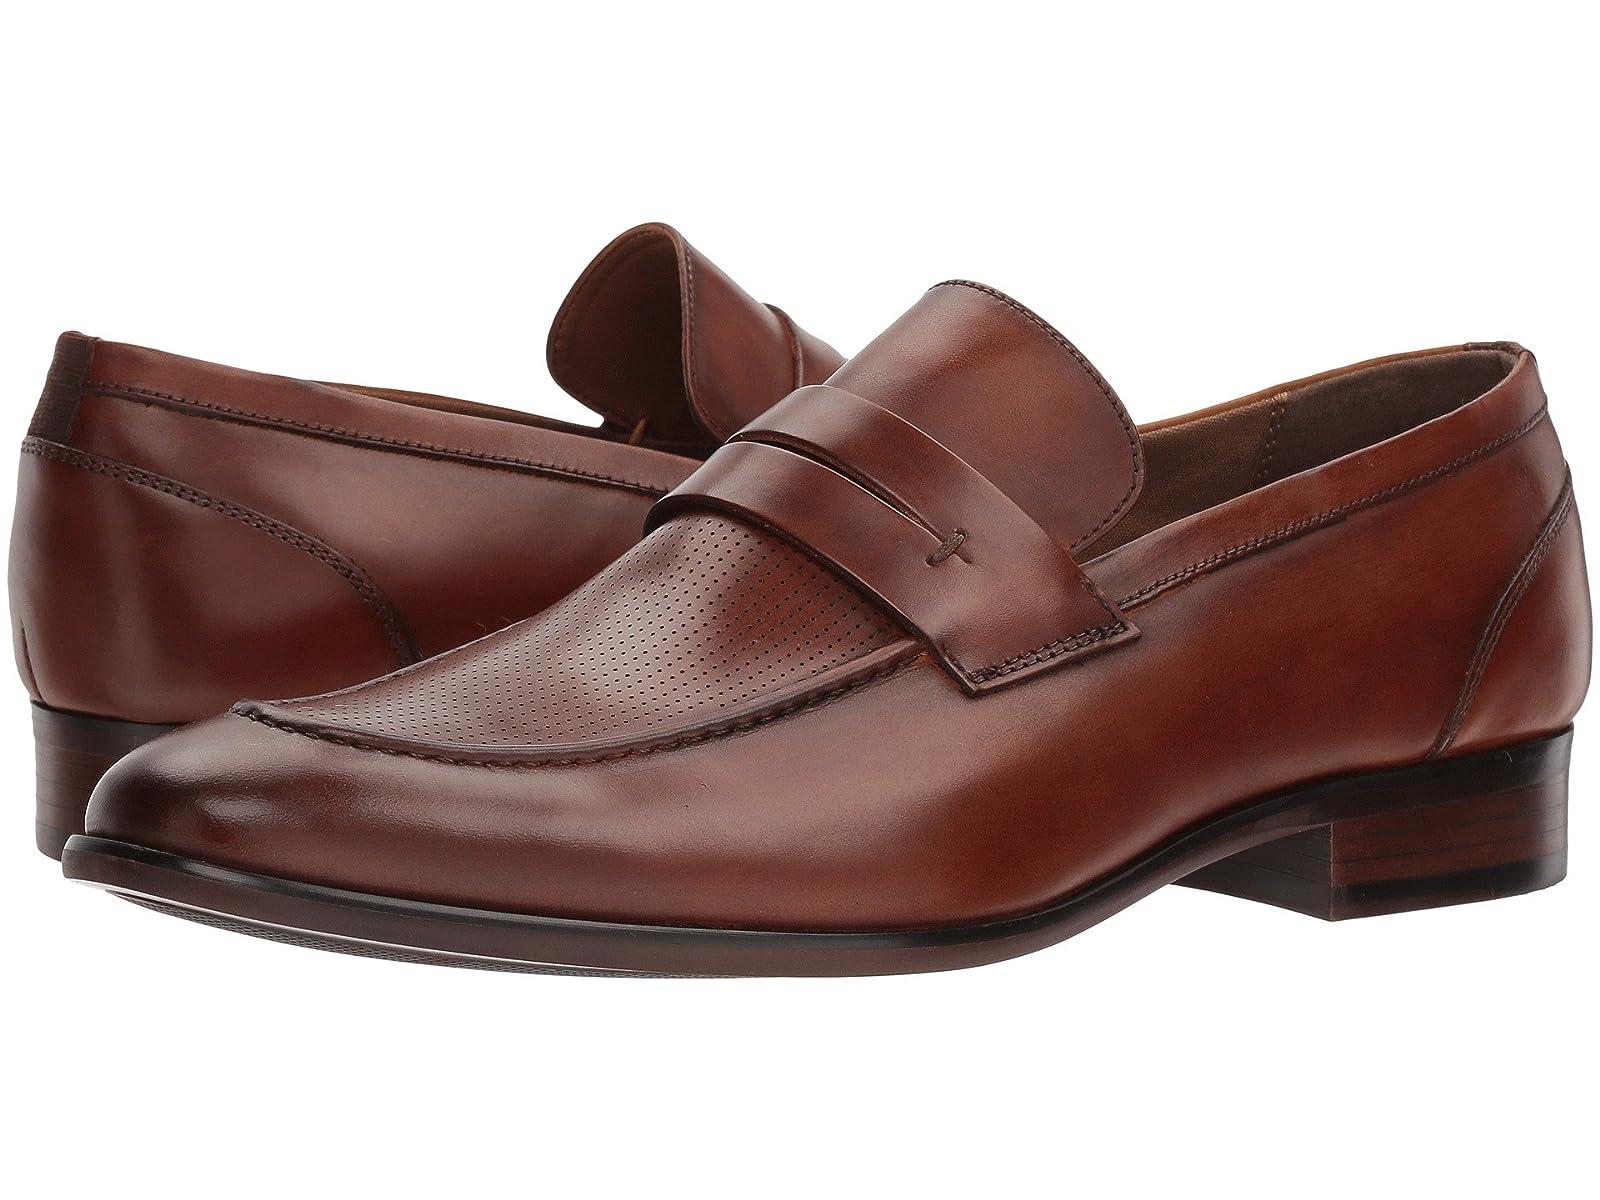 ALDO CamilgaraAtmospheric grades have affordable shoes